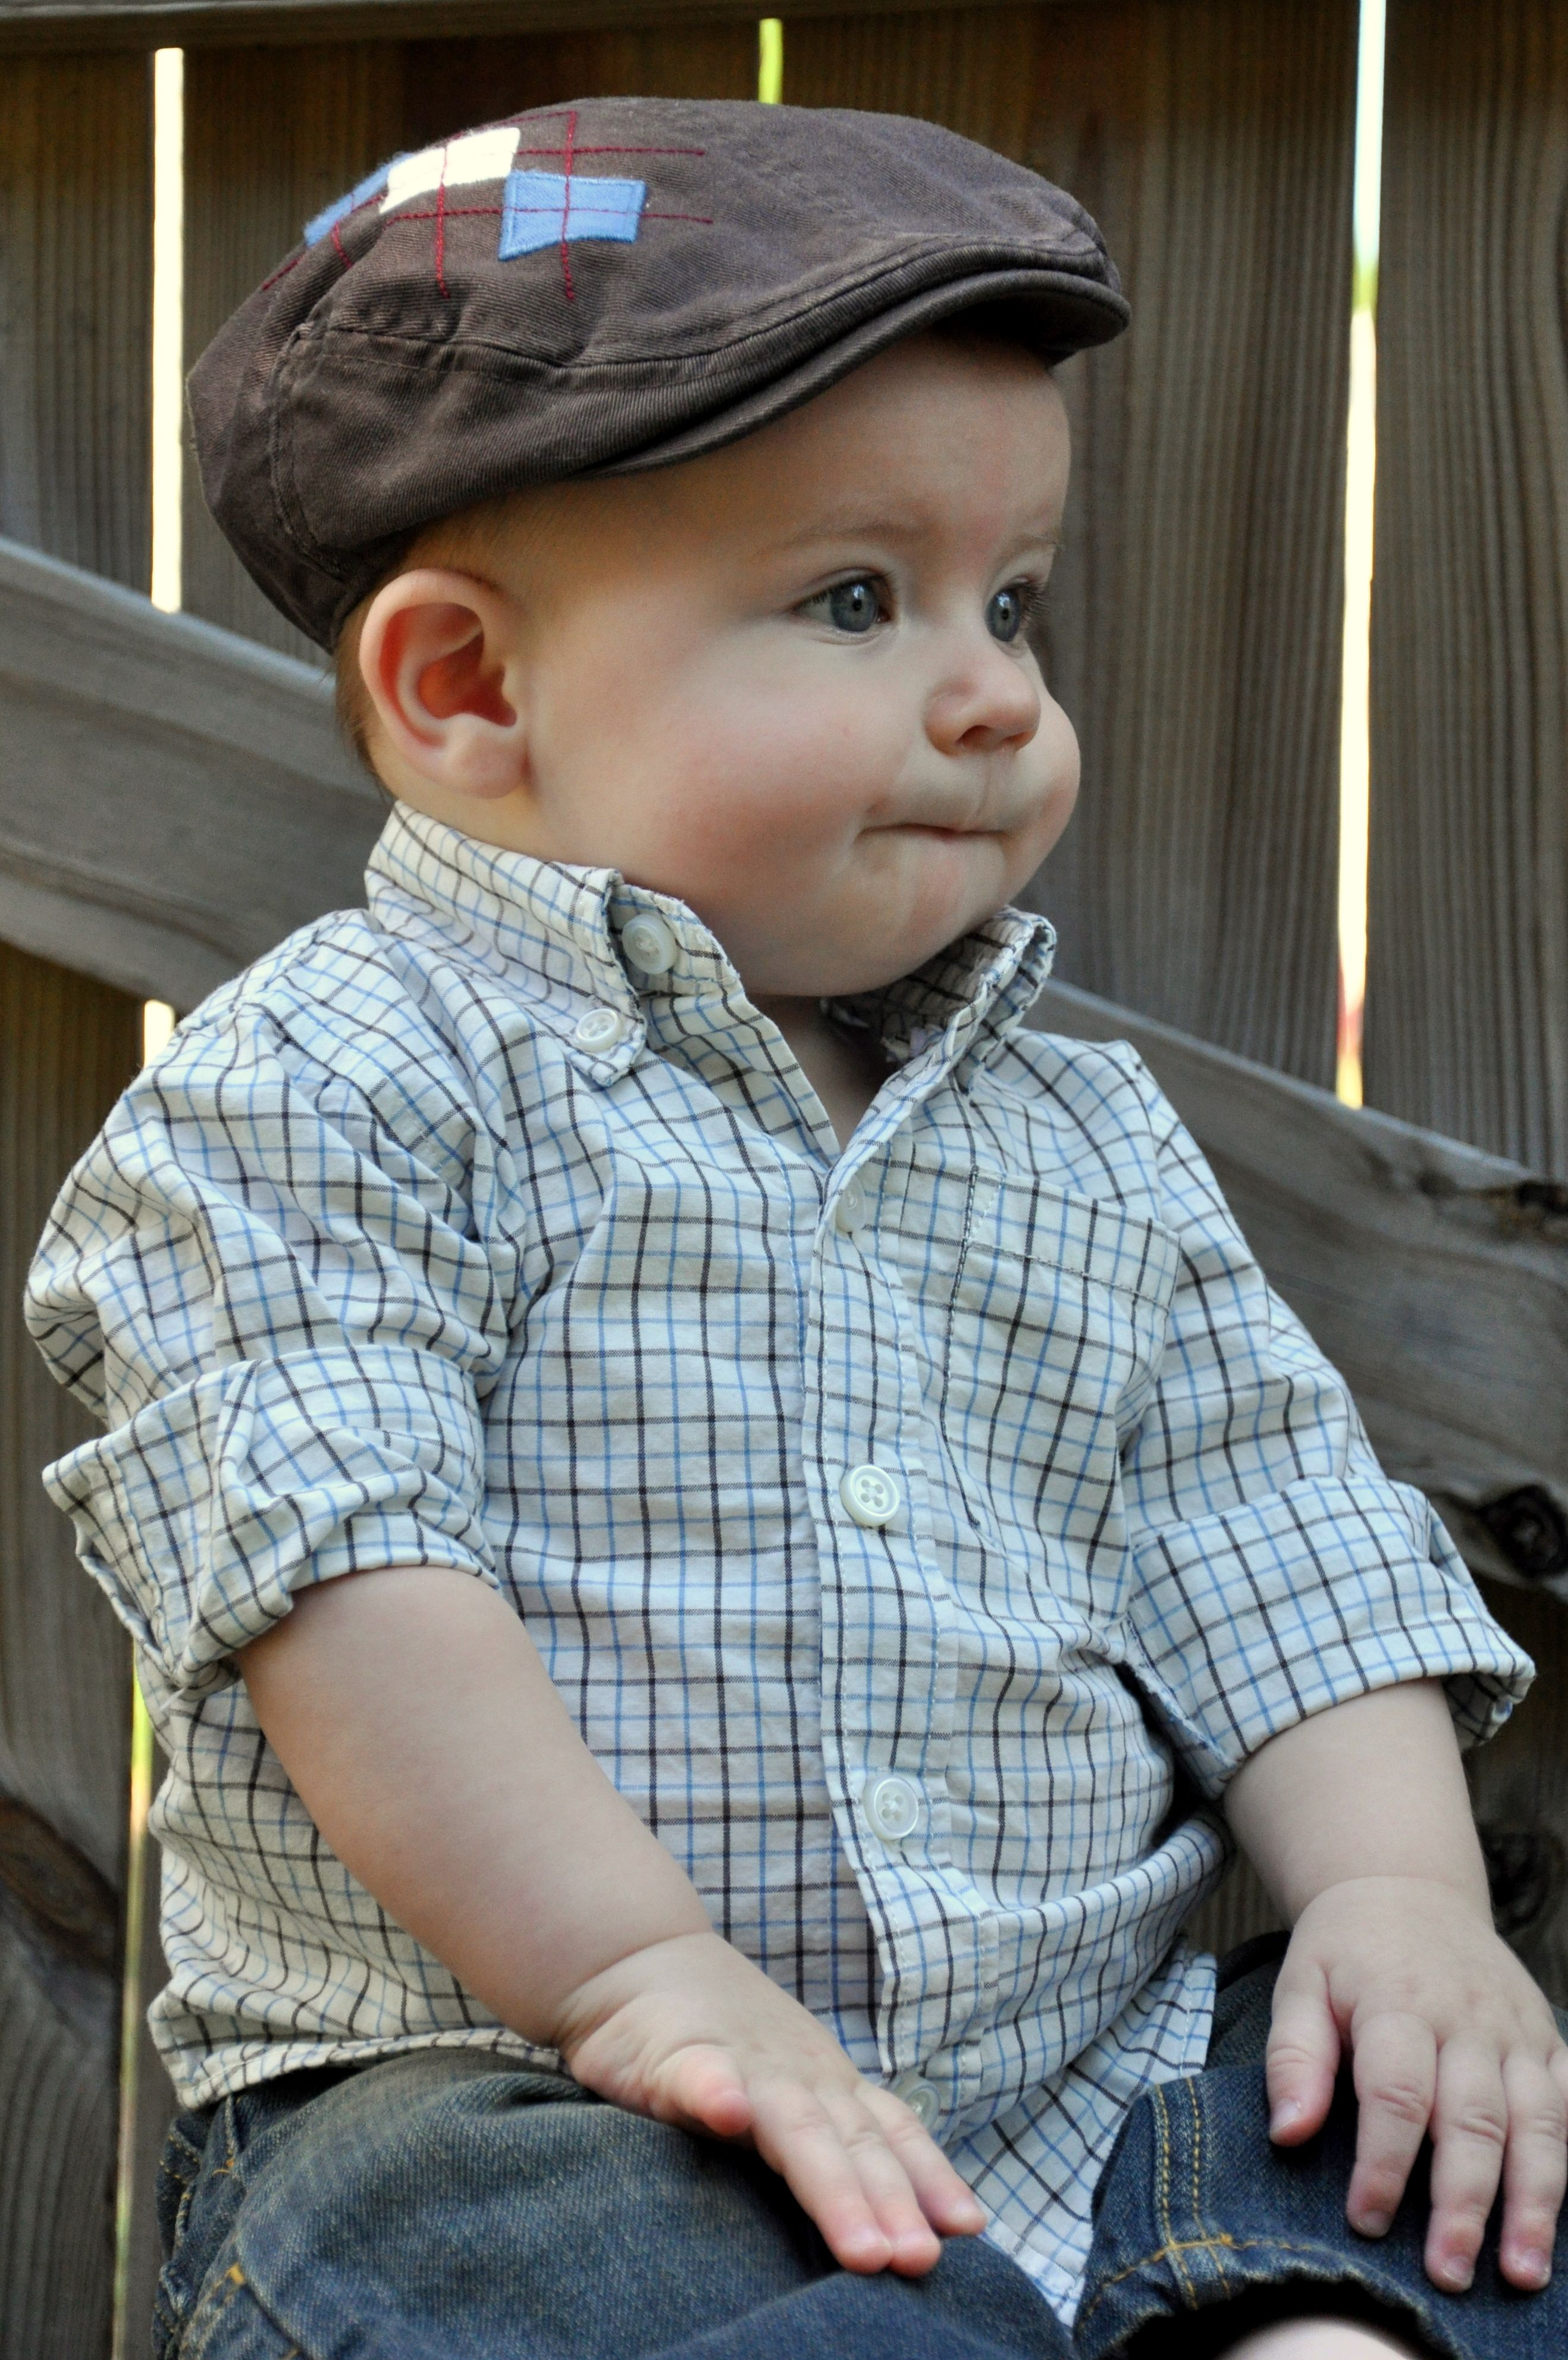 2e3bbcbd1 baby newsboy hat - Google Search | Fall Photoshoot | News boy hat ...